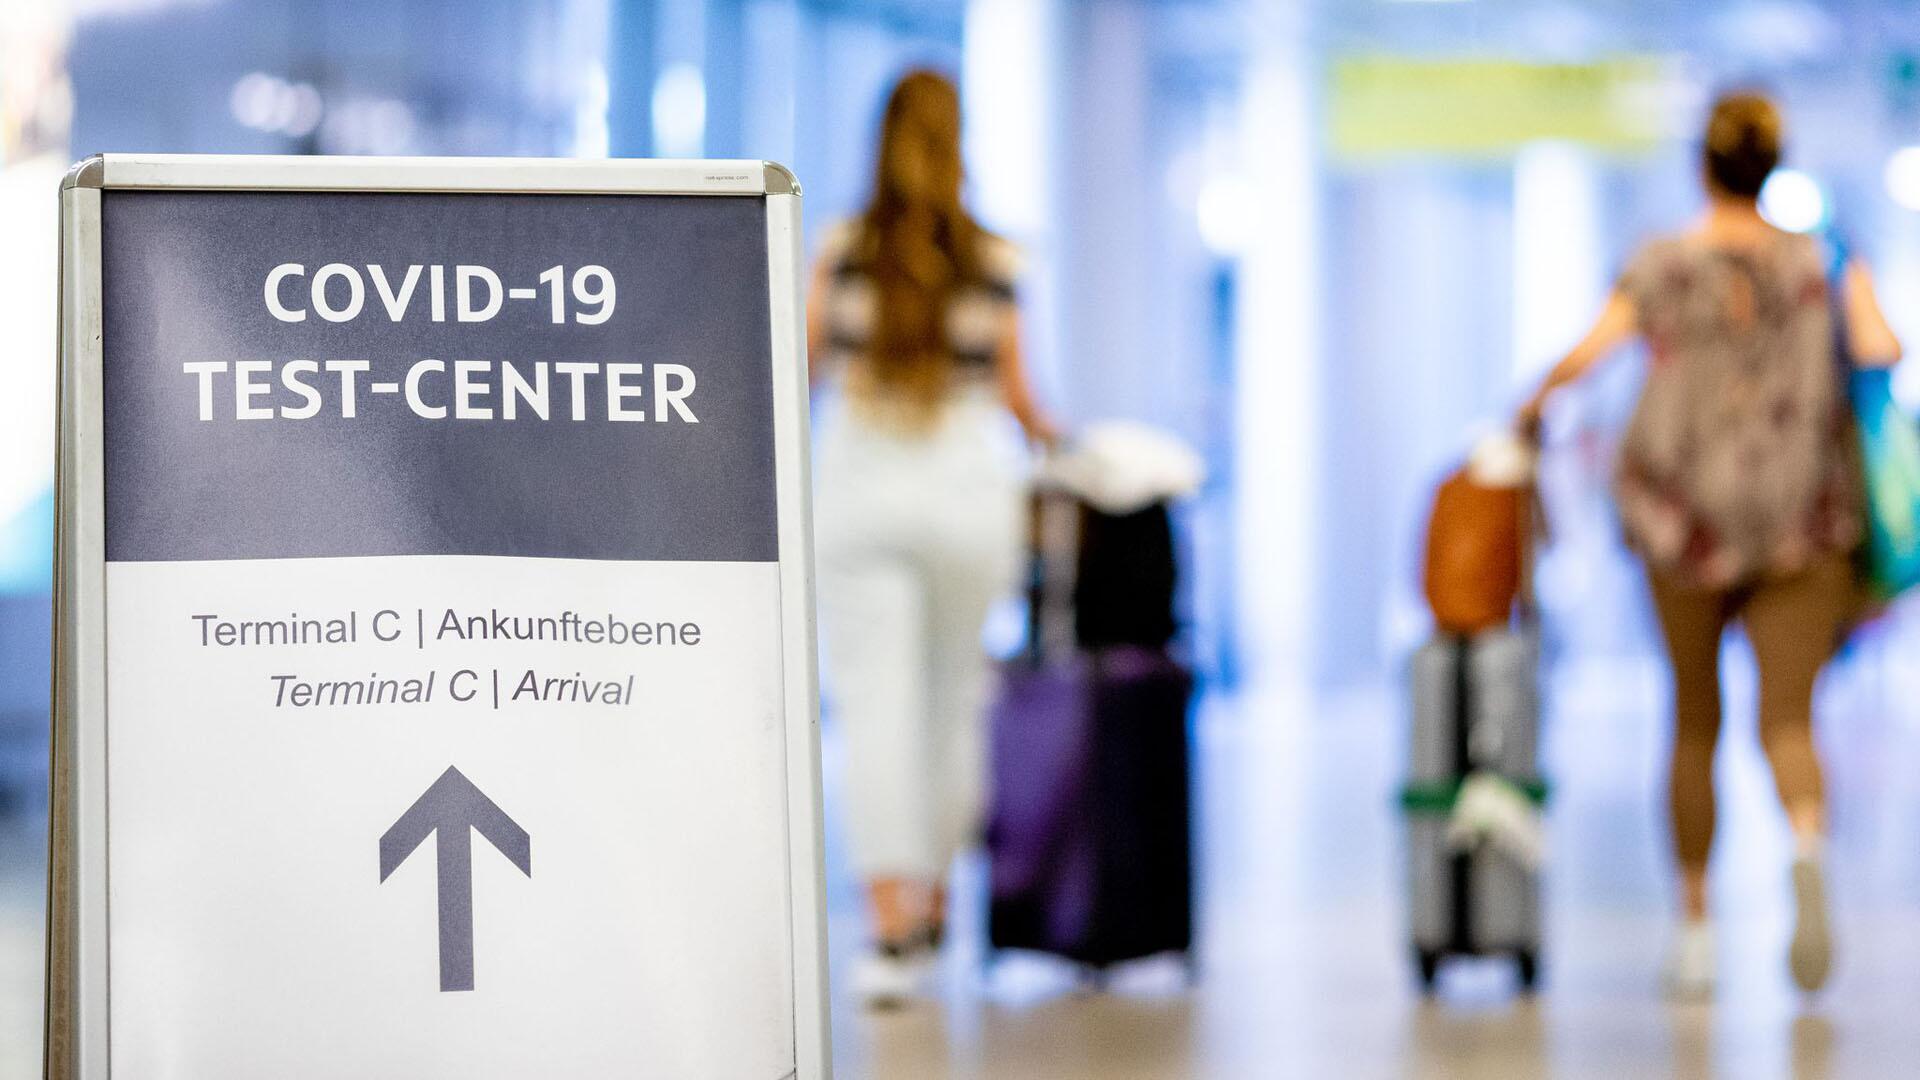 Bild zu Corona-Testzentrum am Flughafen